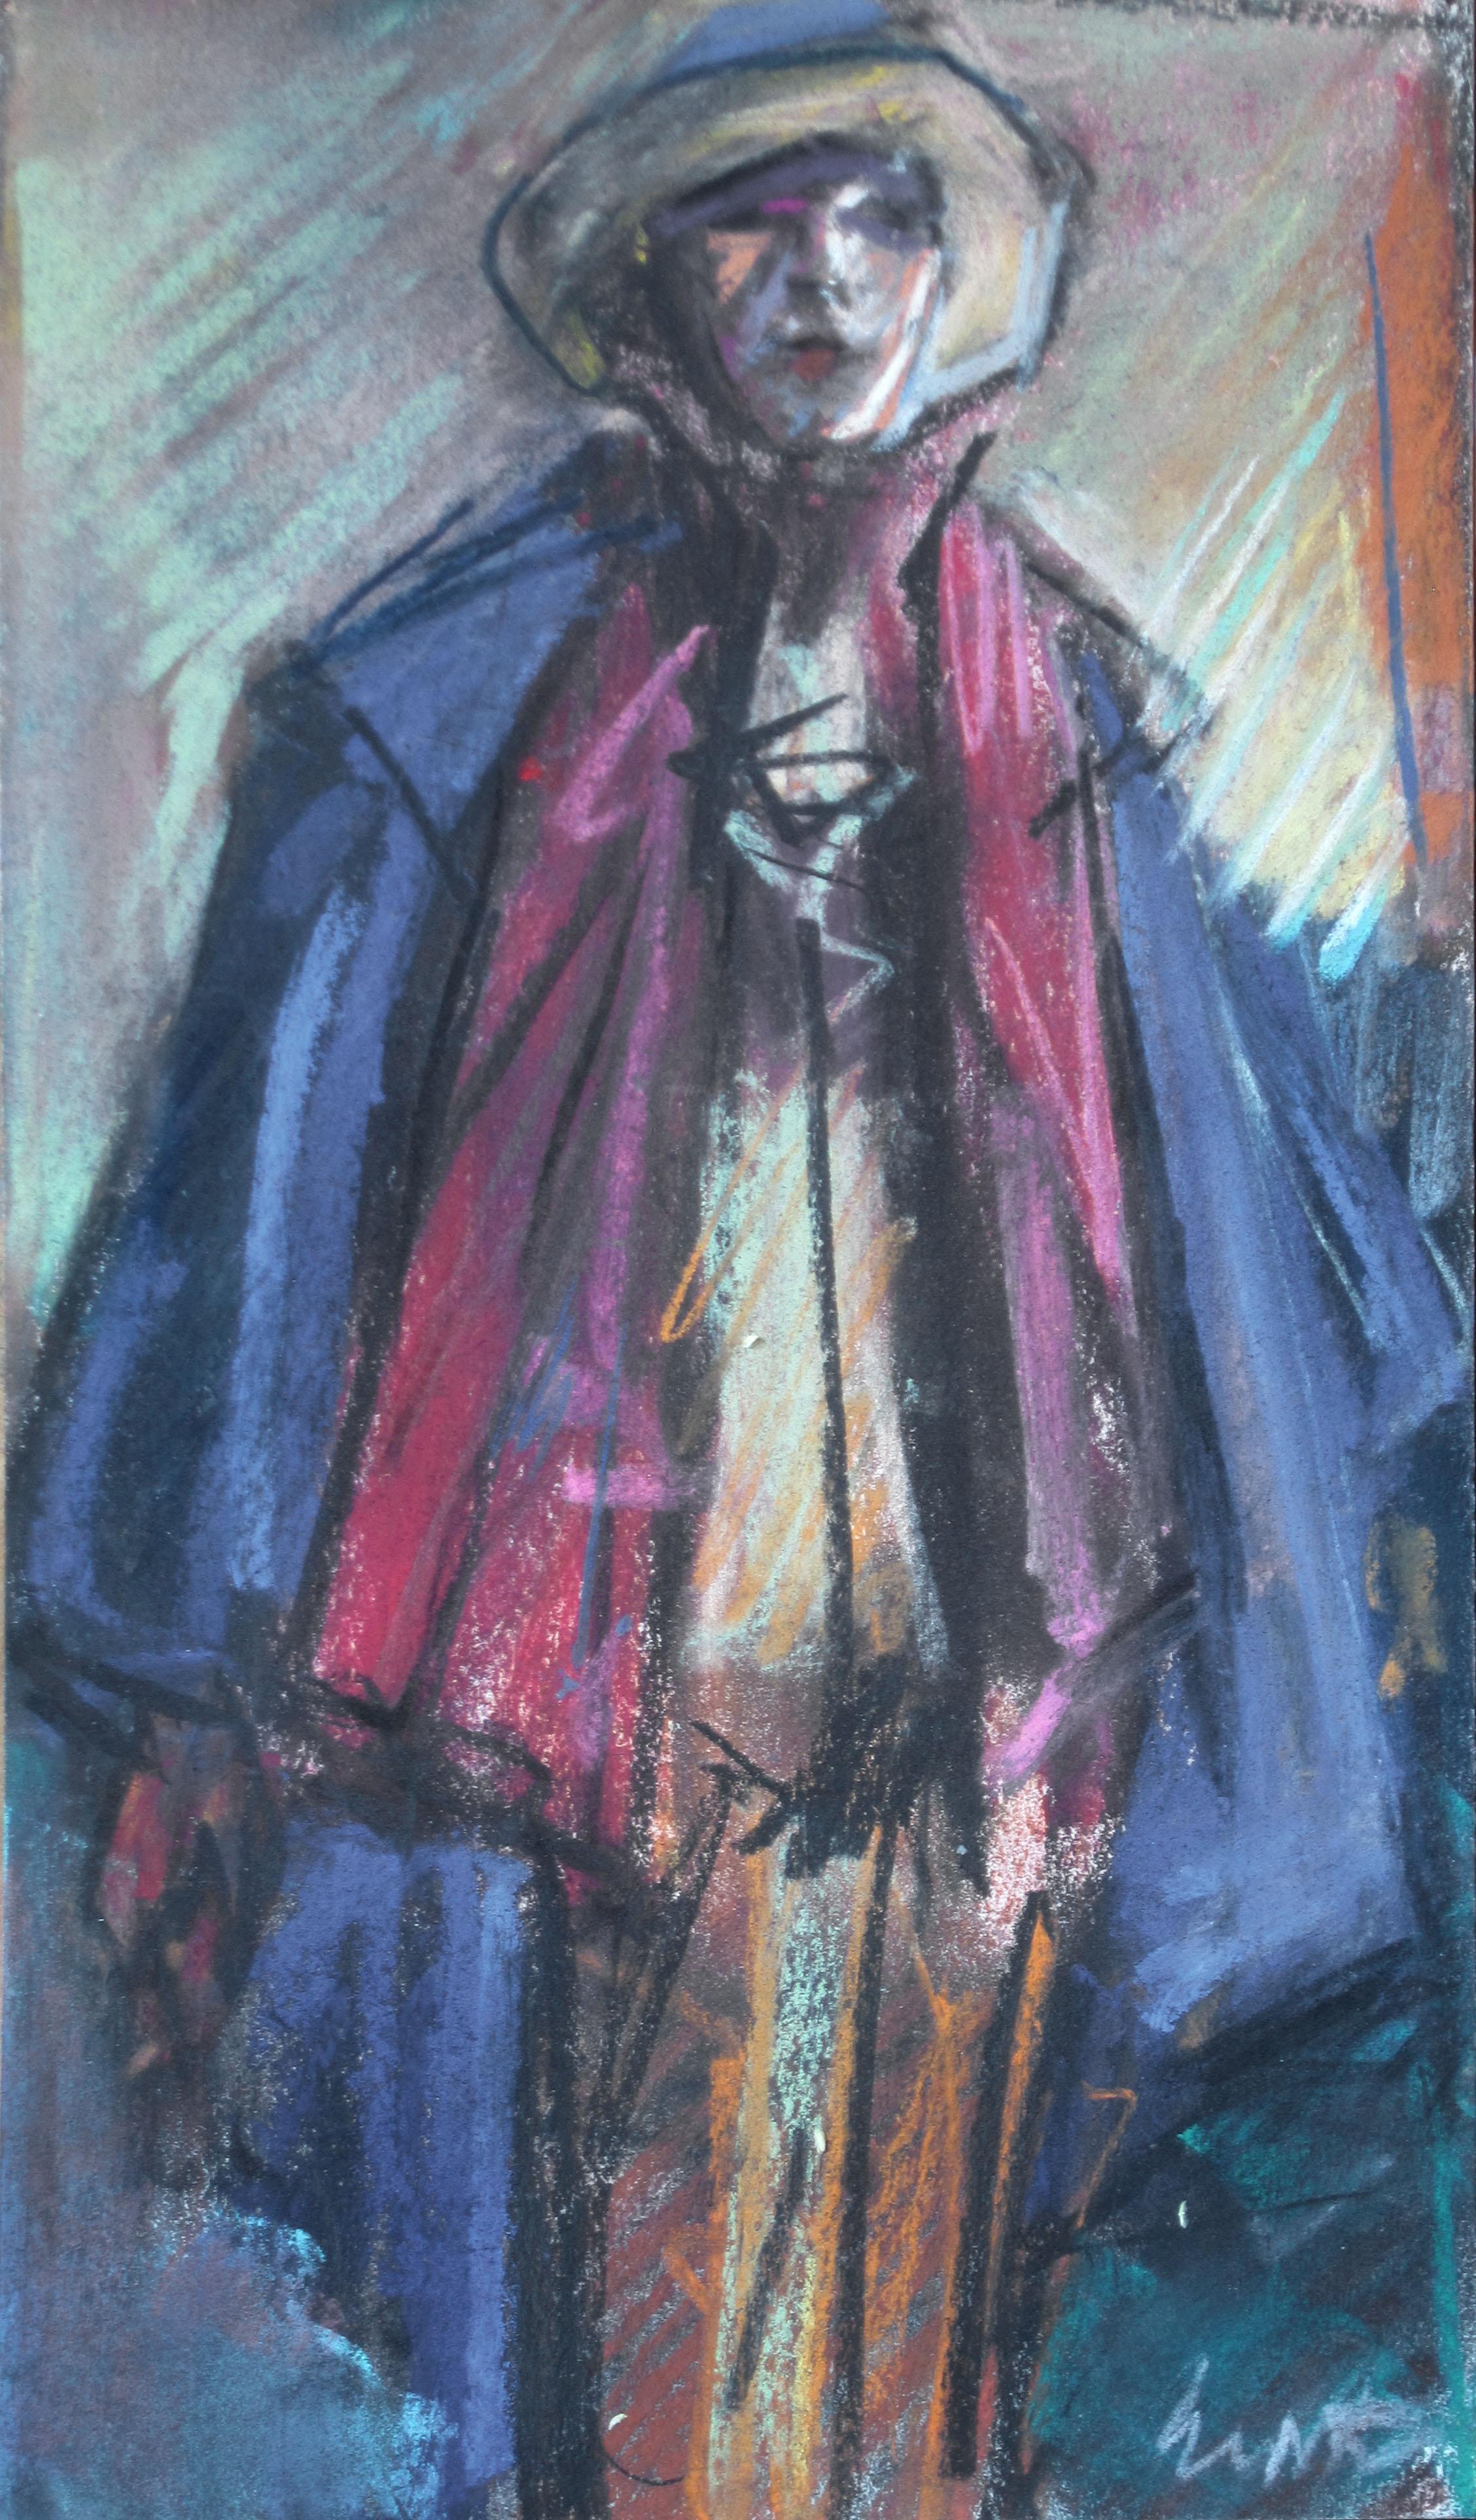 Man with Blue Cloak